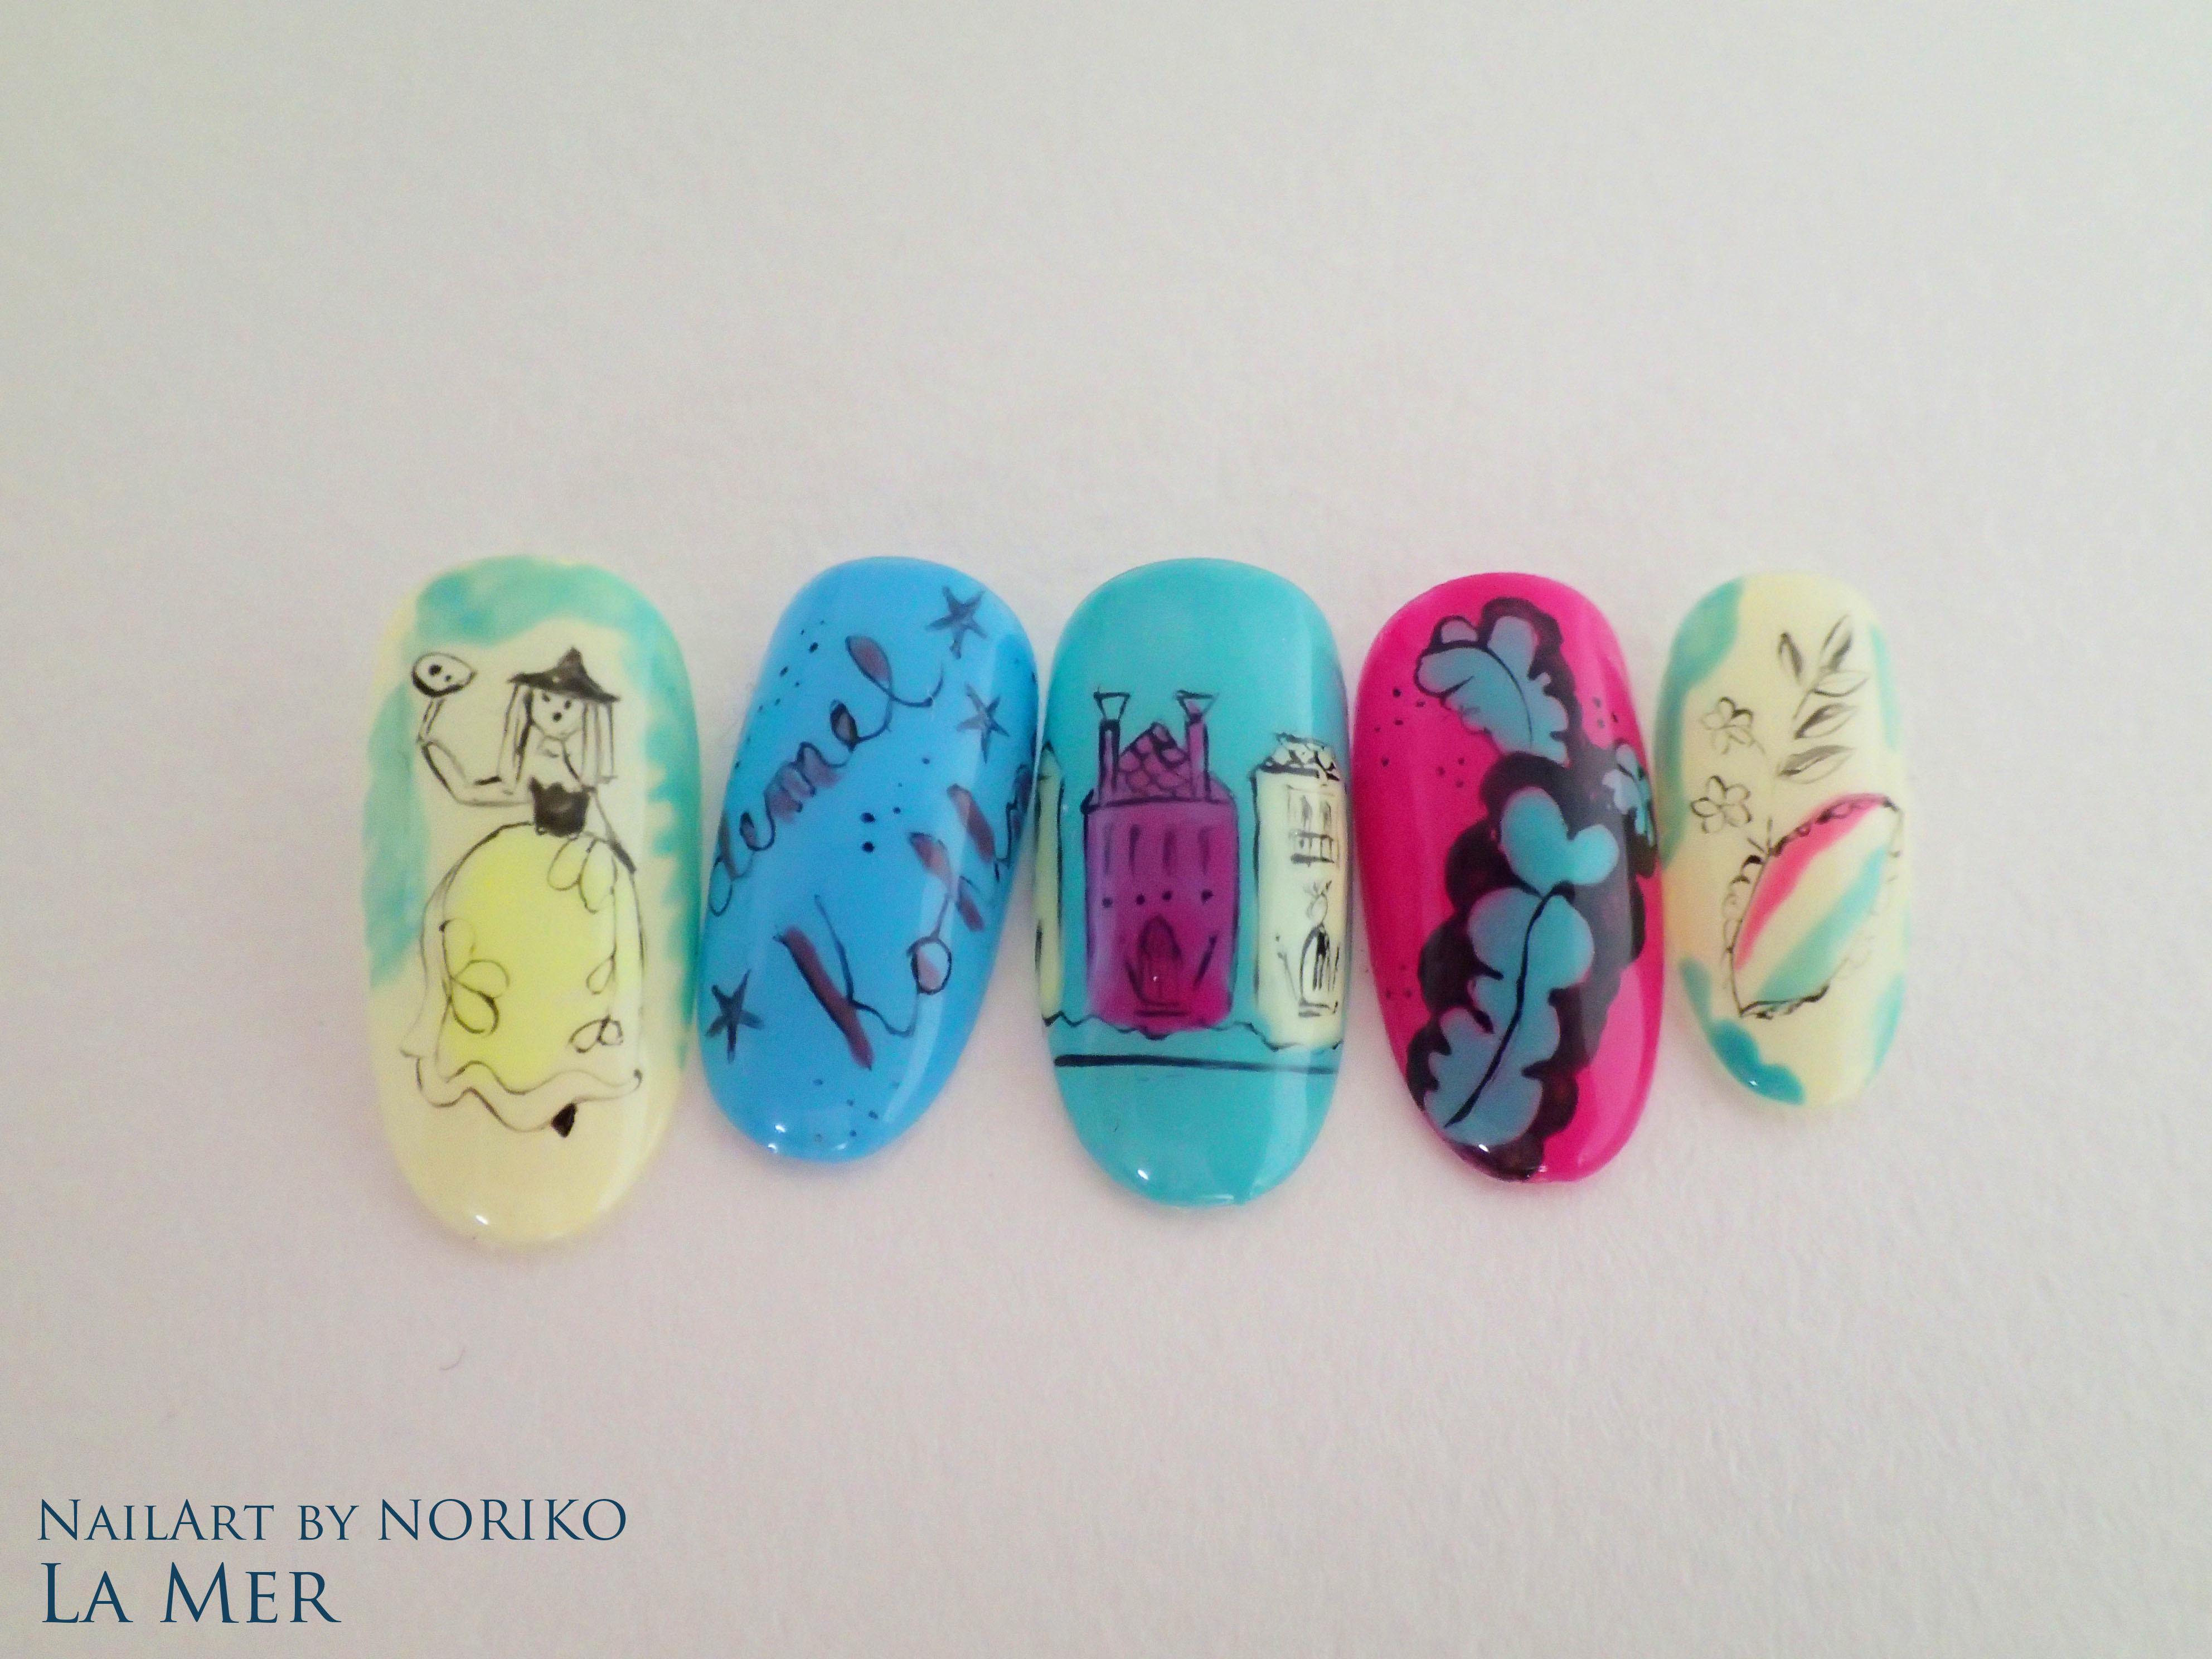 Nail Artist NORIKO demel 8